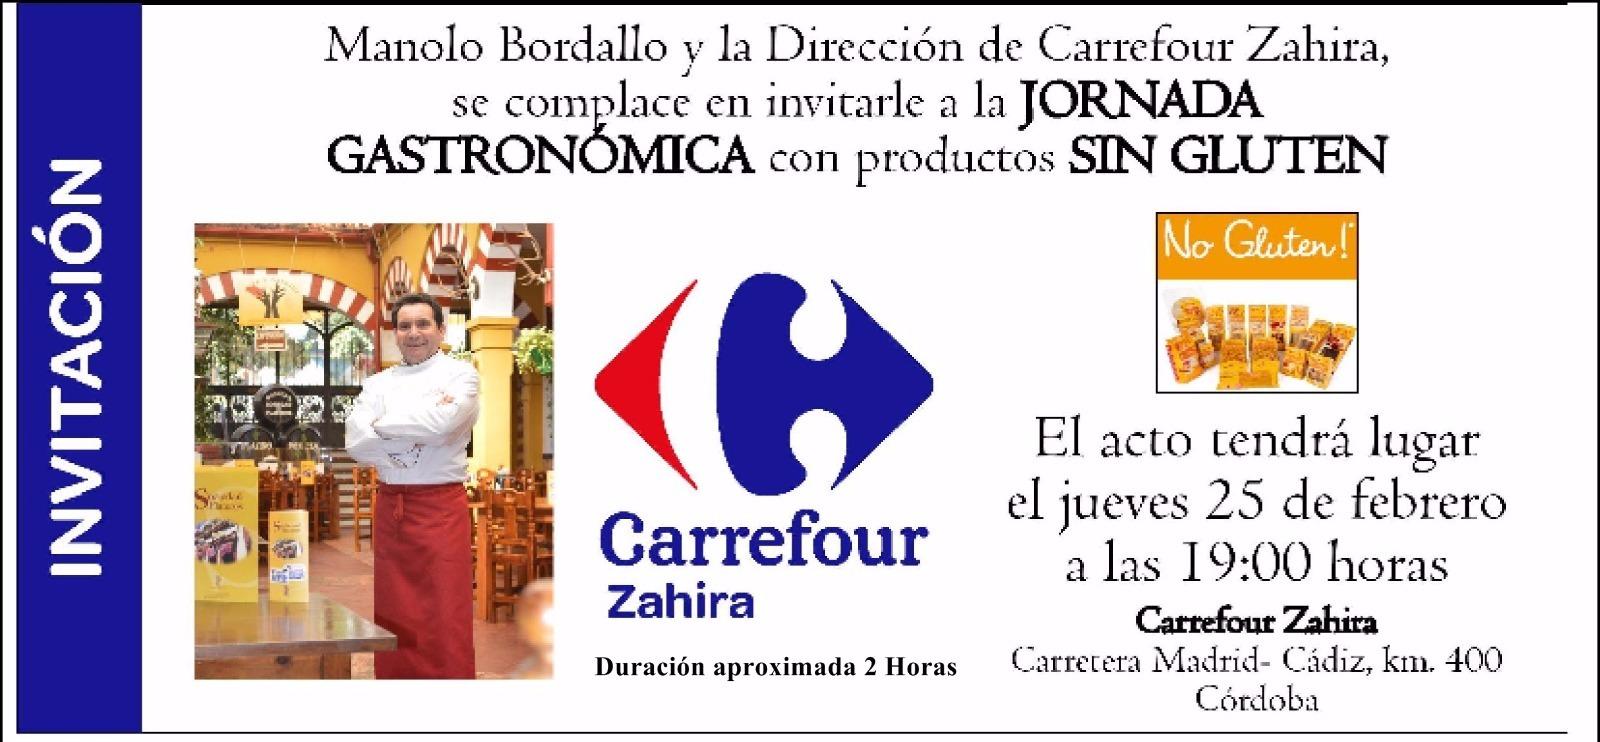 Invitacion Manolo Bordallo en la Jornada Gastronomica sin Gluten de Carrefour Zahira